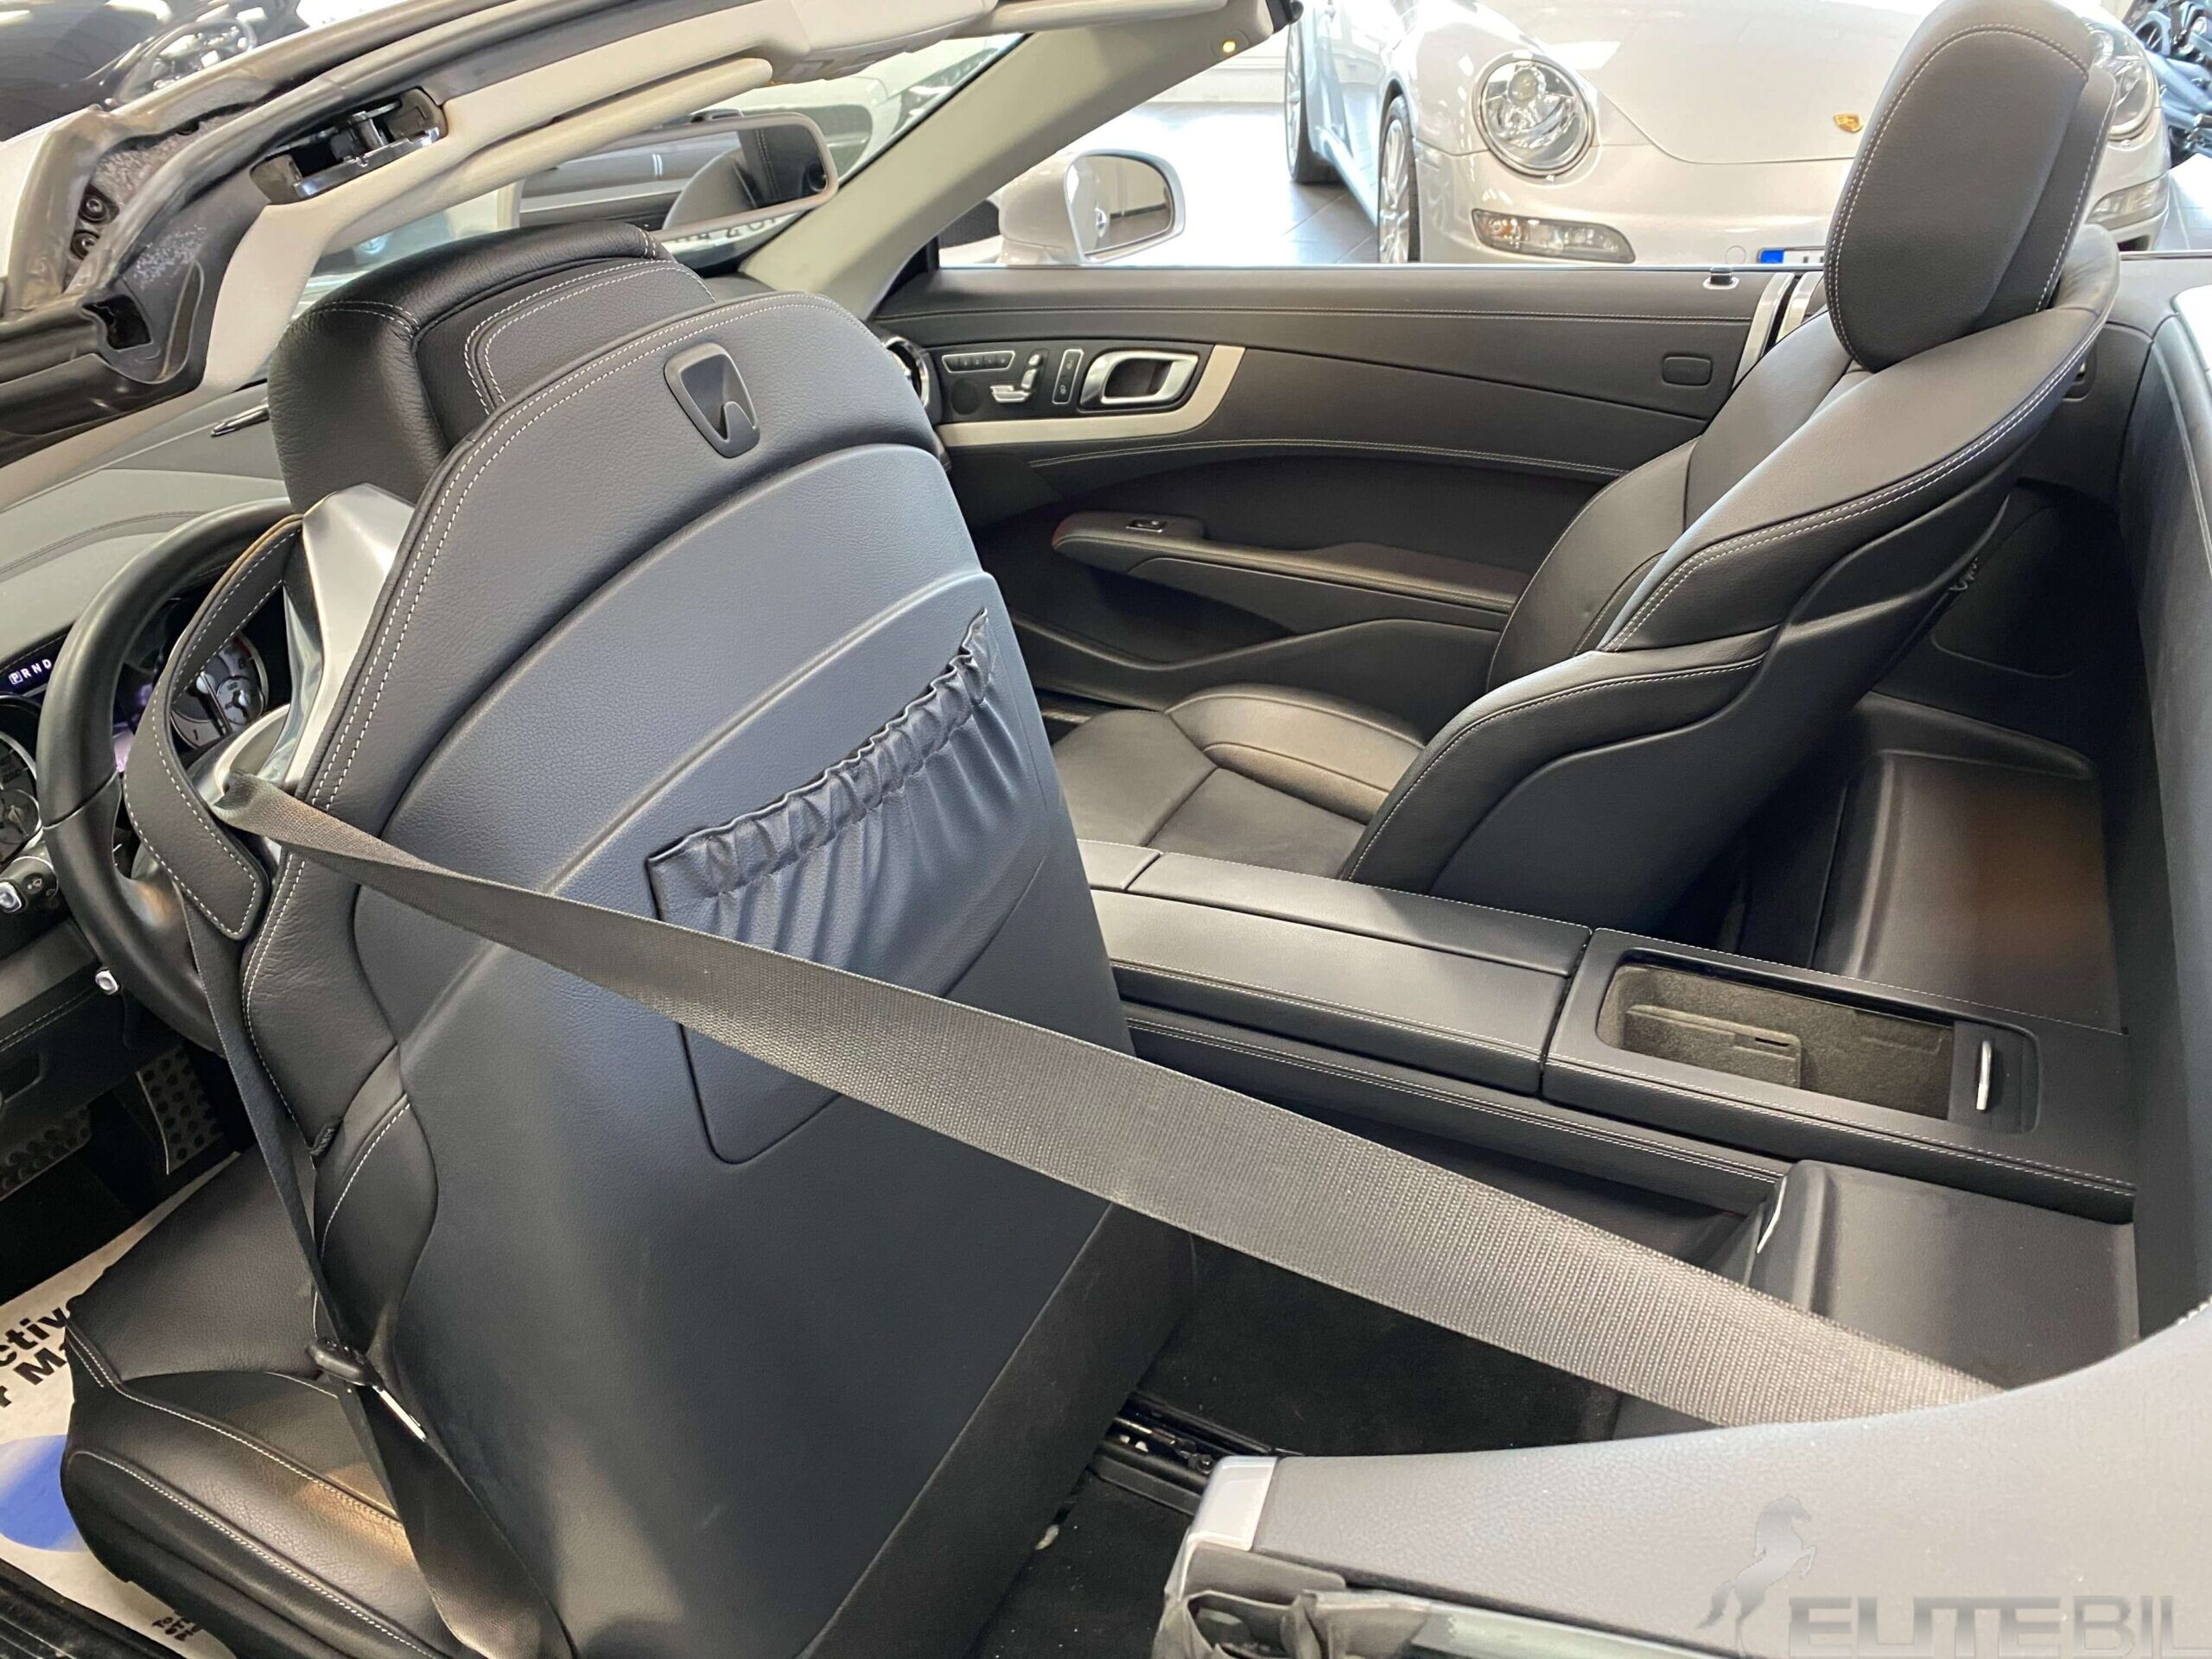 Mercedes-Benz SL 350 7G-Tronic 306hk Bör Ses (18)